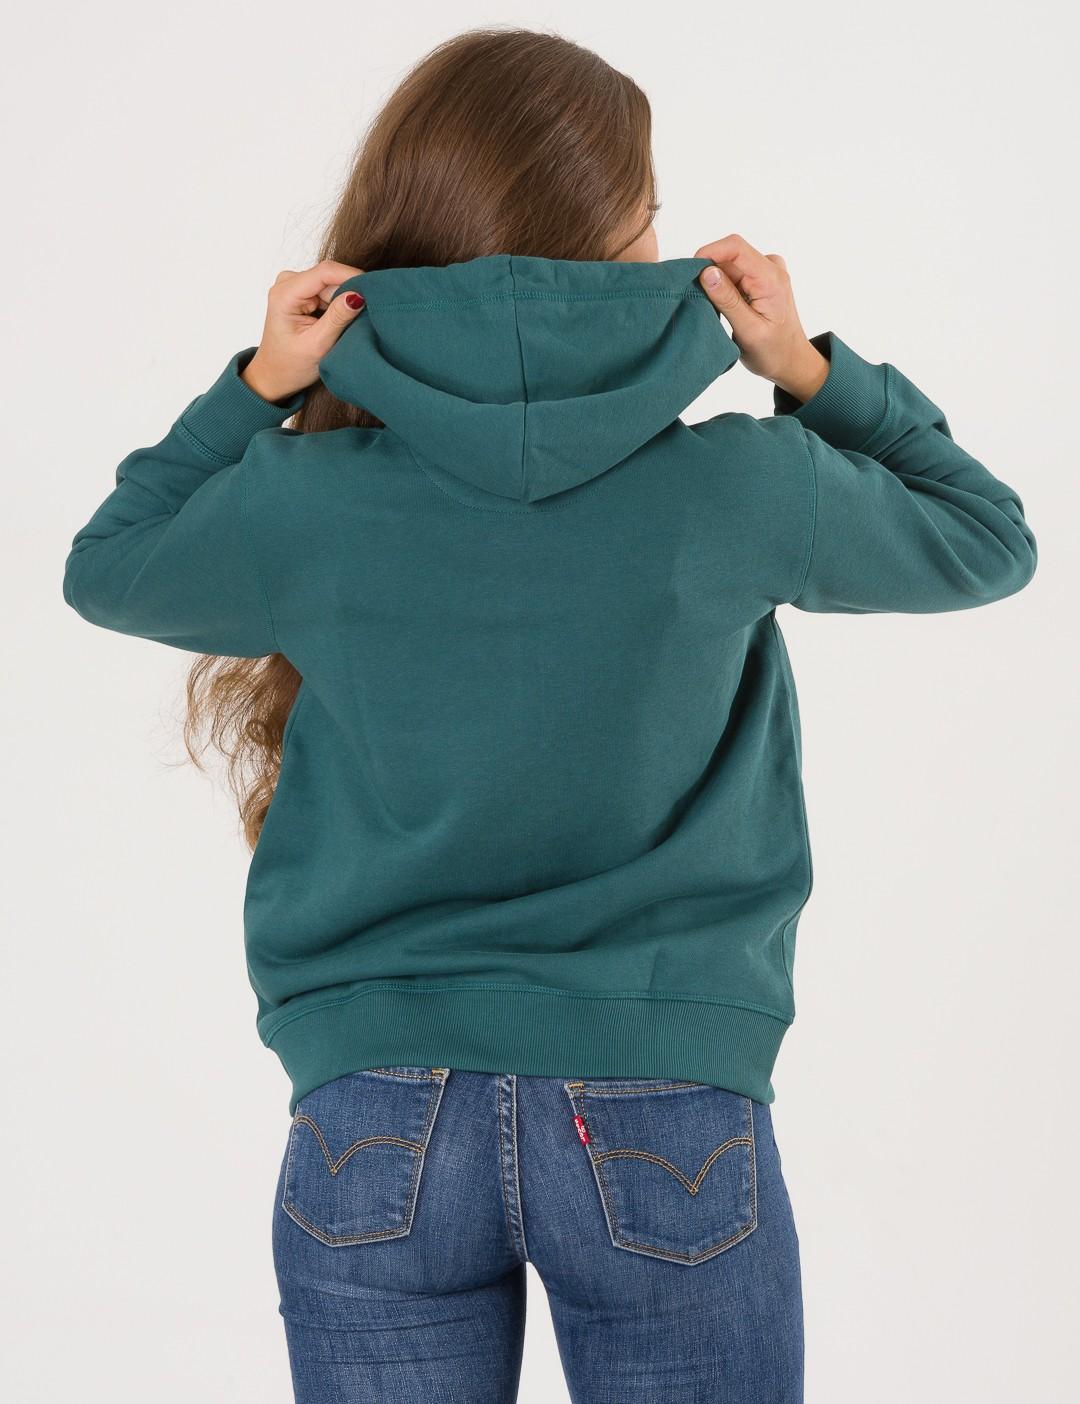 fe5a9ce4379 Hoodie Från Om Grön Gant Full Zip Tb Kidsbrandstore qqYIwgv